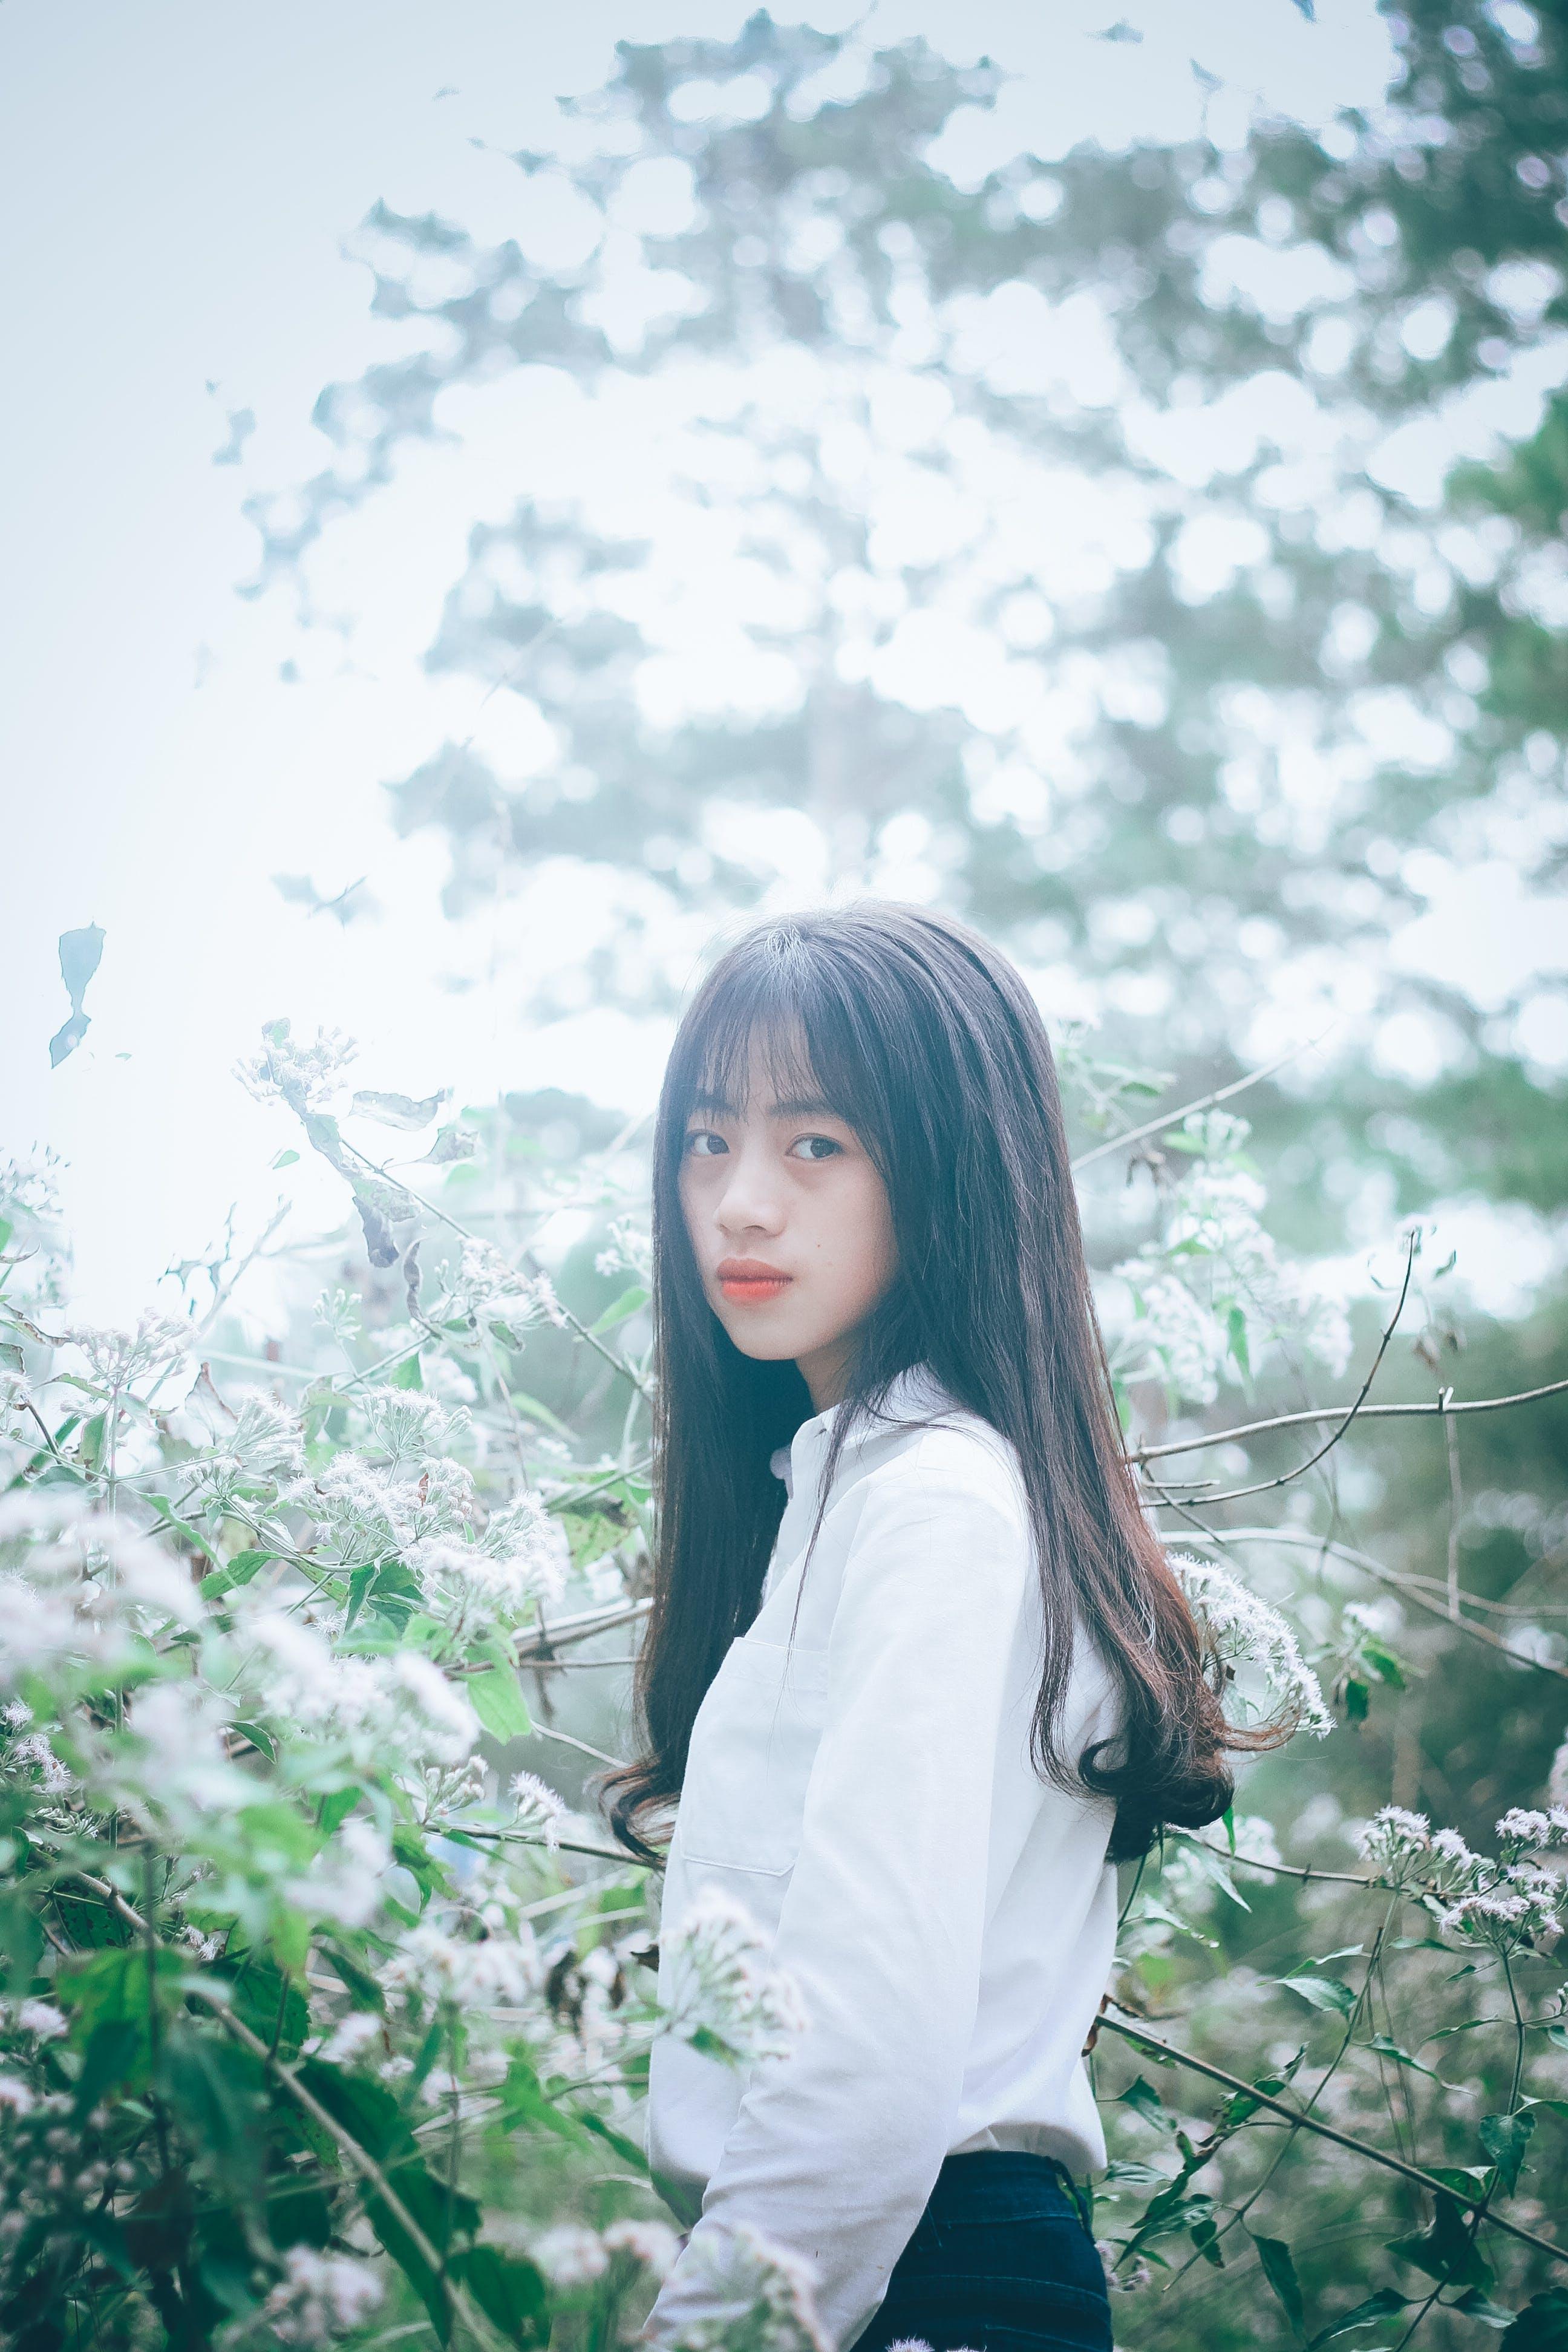 Gratis arkivbilde med asiatisk jente, asiatisk kvinne, attraktiv, blomster